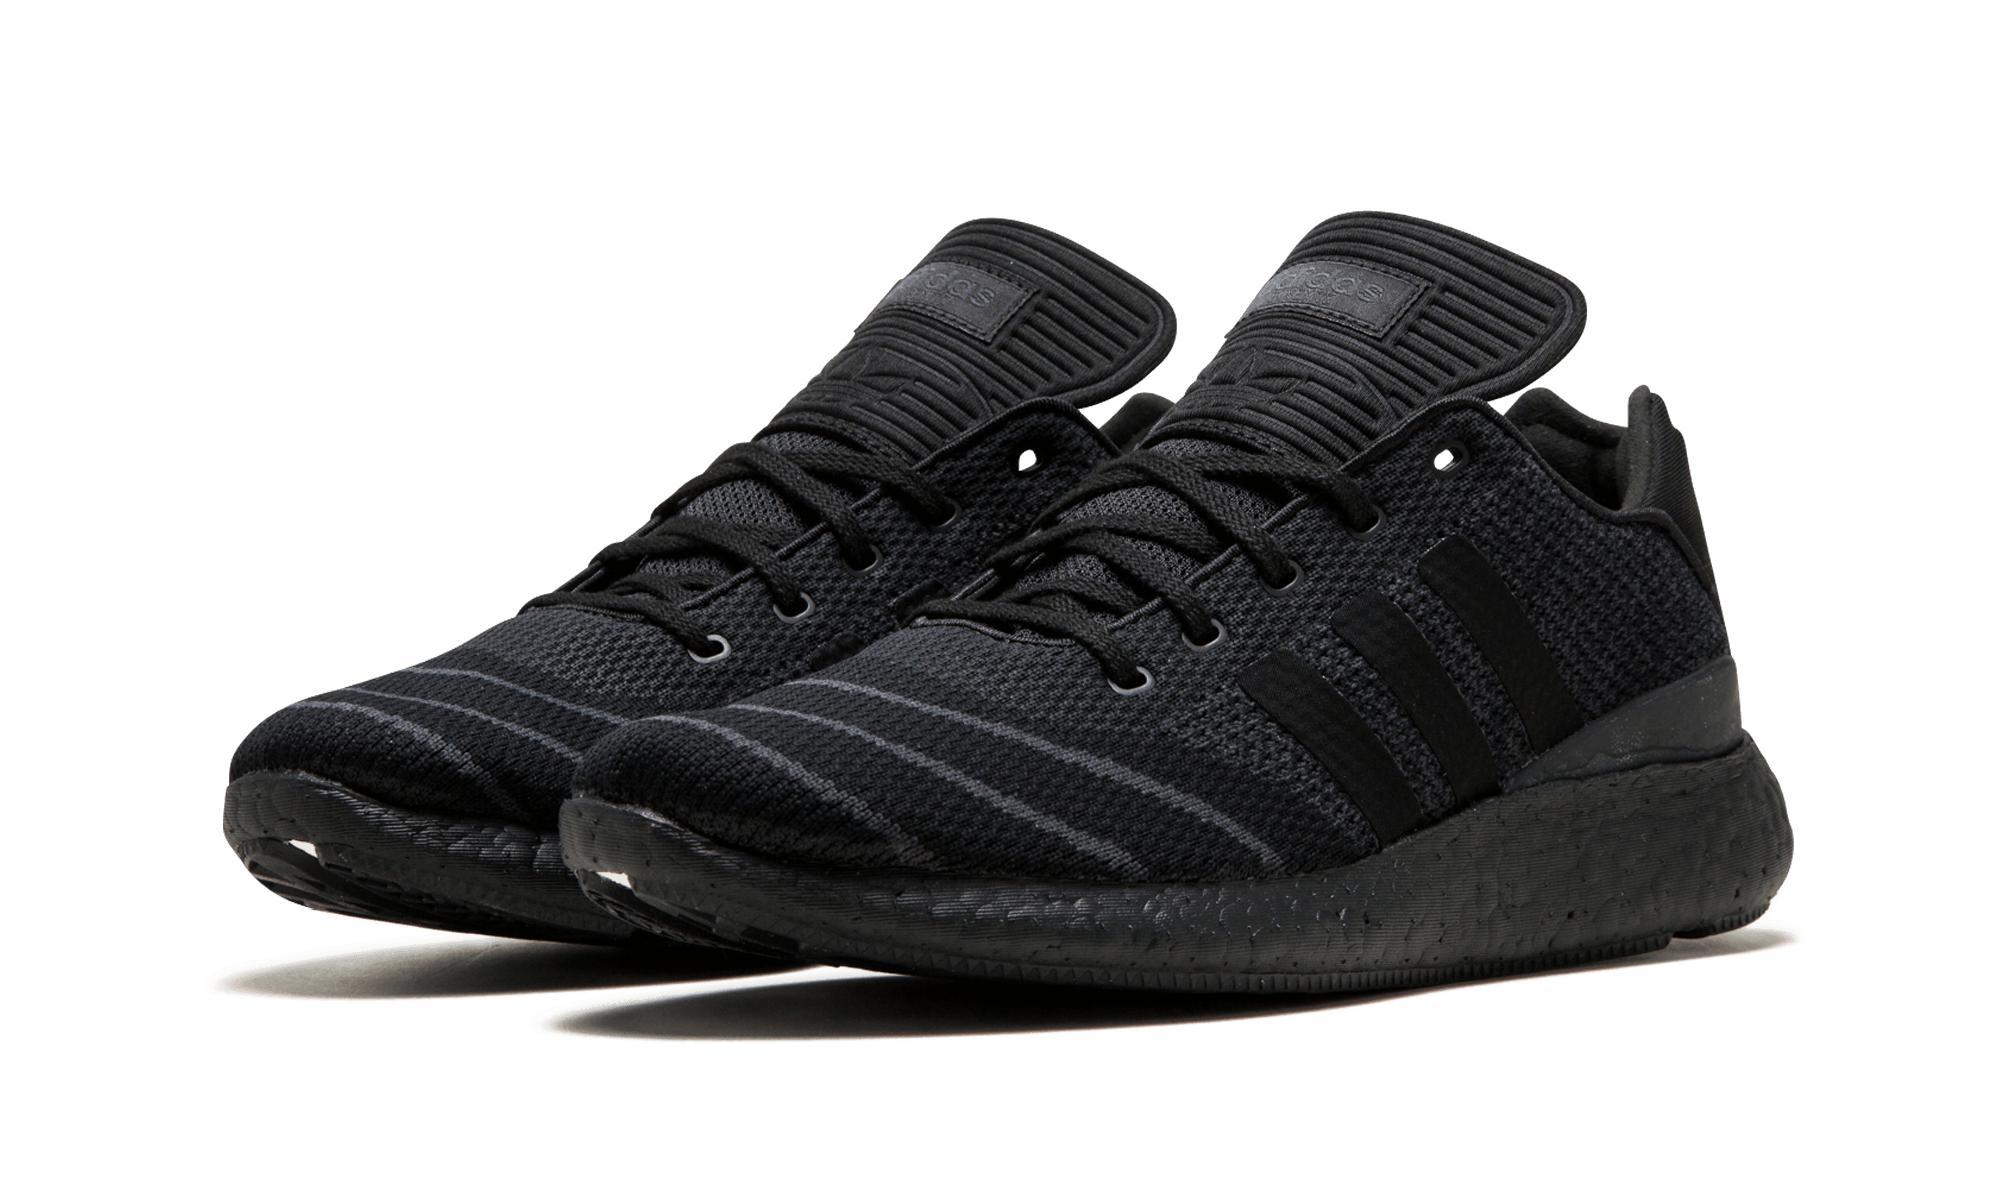 reputable site cc8f8 ab863 Adidas - Black Busenitz Pure Boost Pk for Men - Lyst. View fullscreen